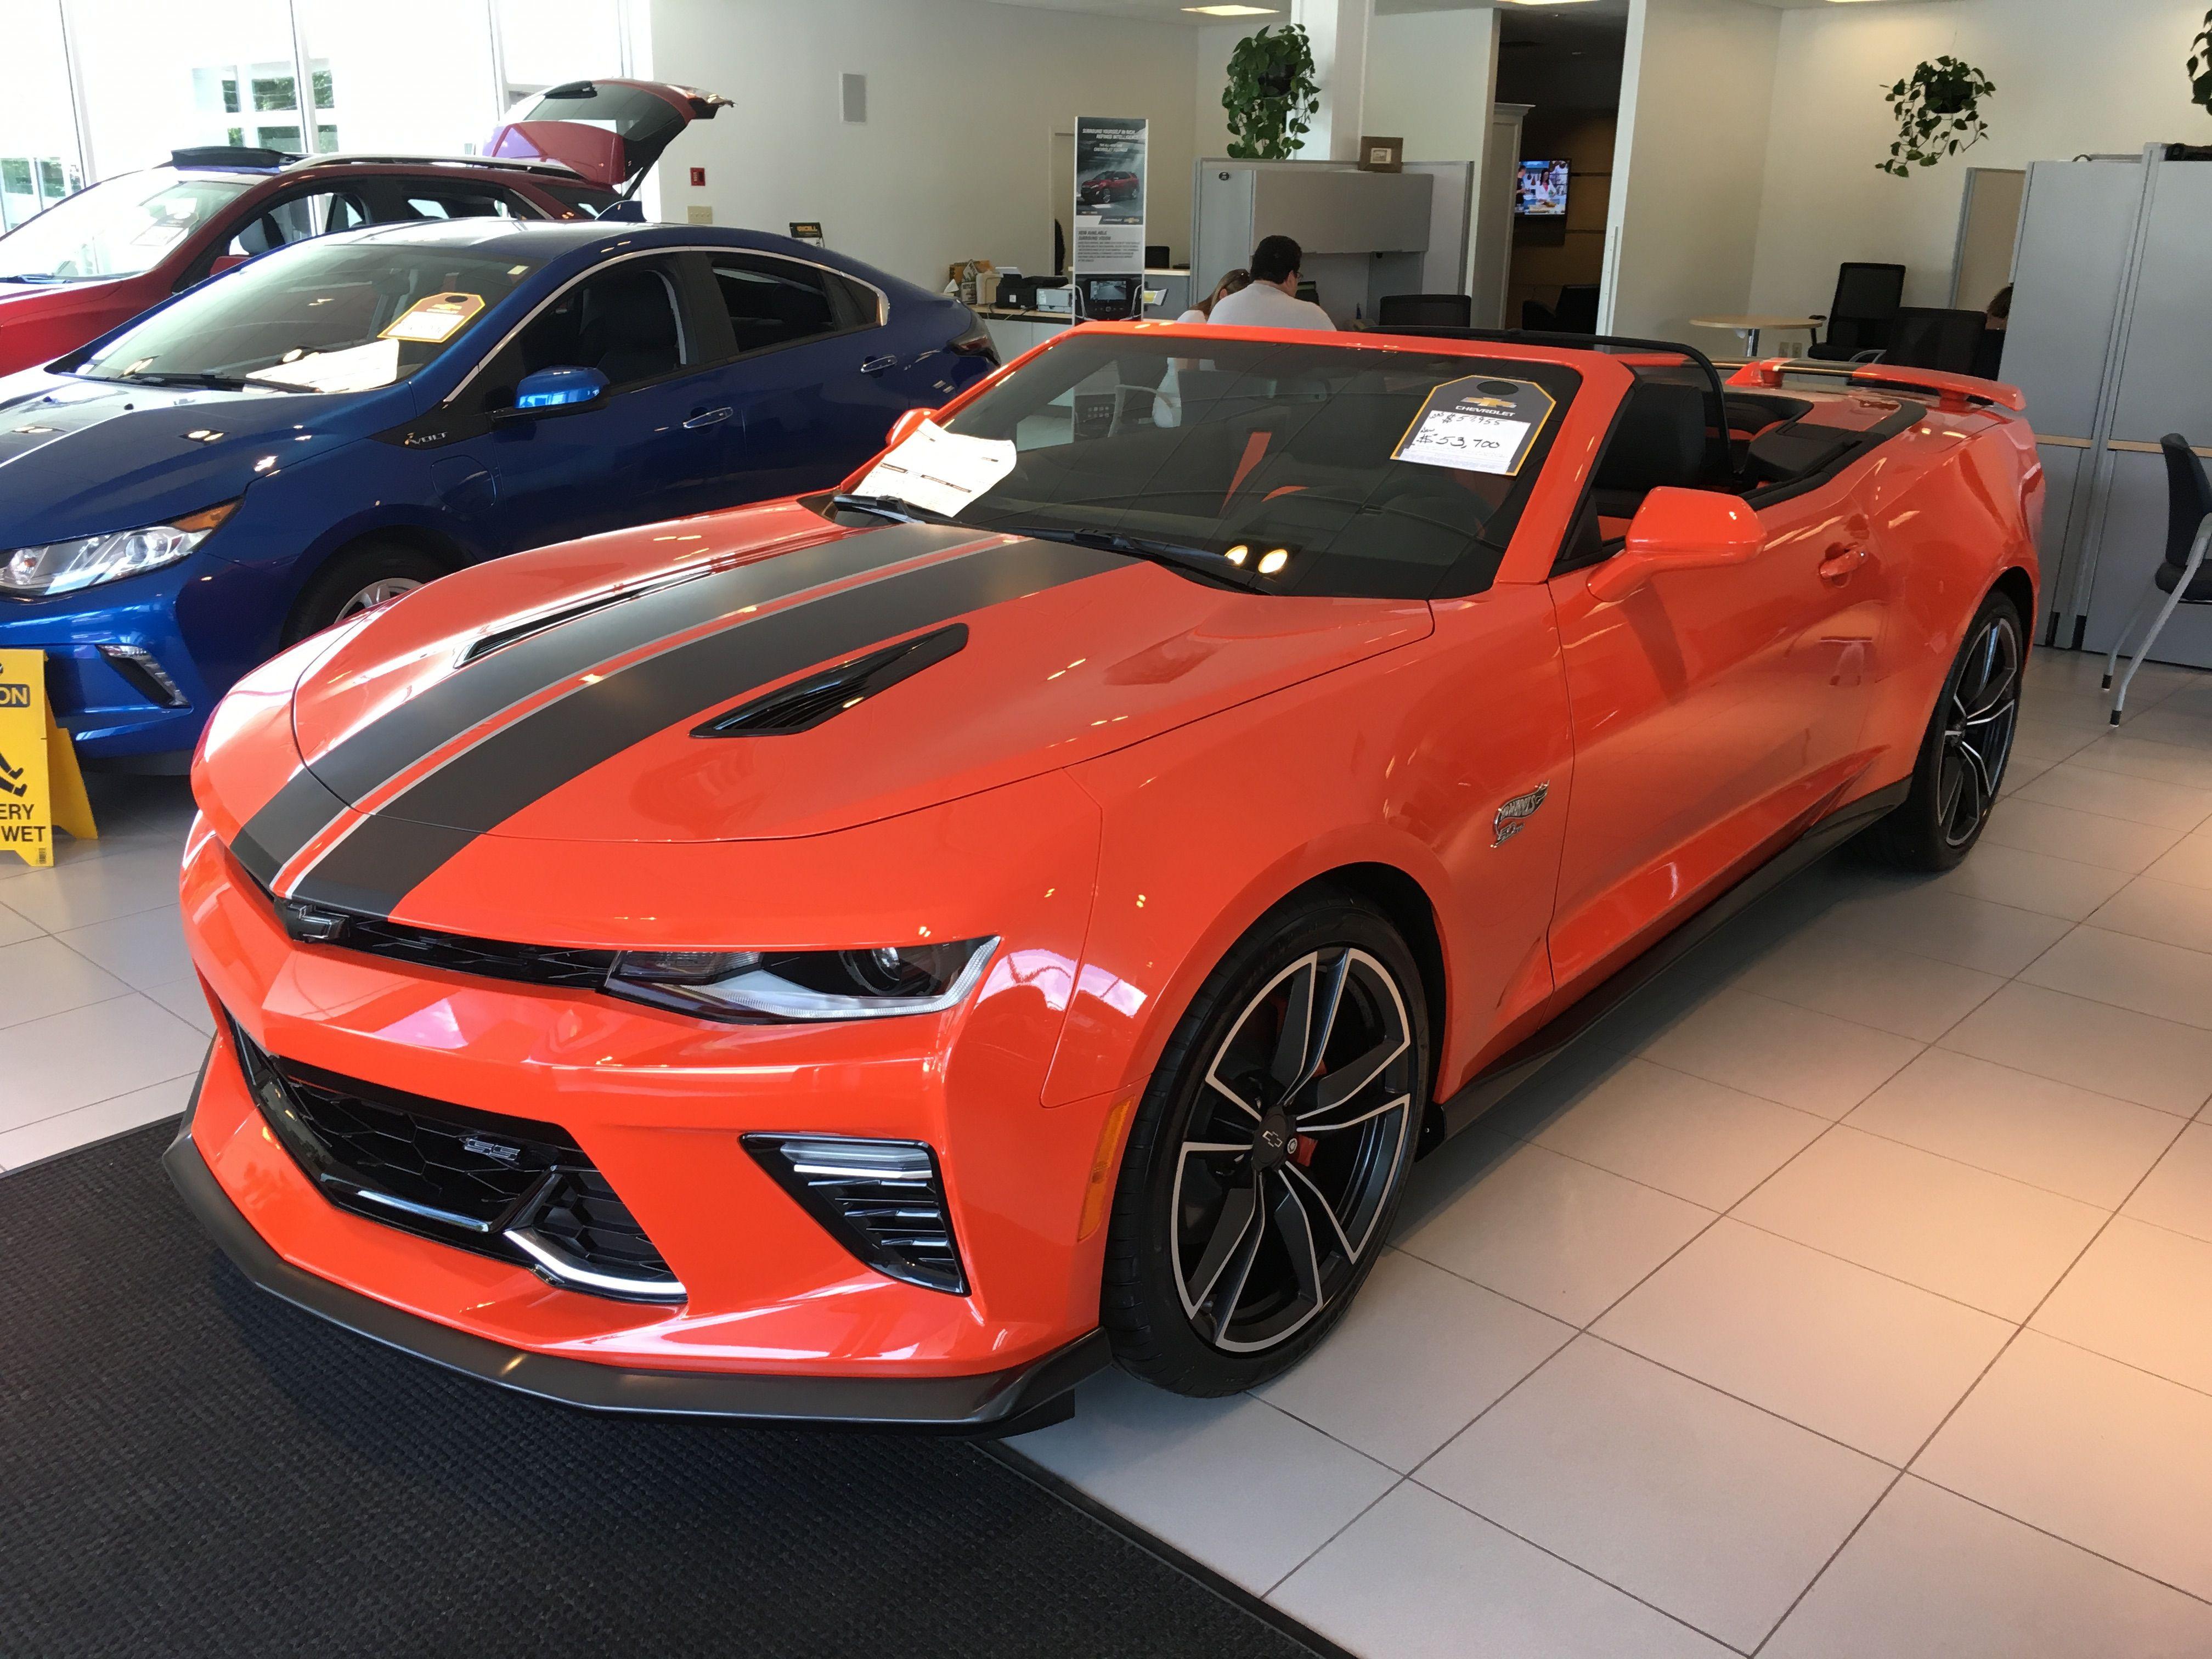 2018 Chevrolet Camaro Convertible Hot Wheels Edition